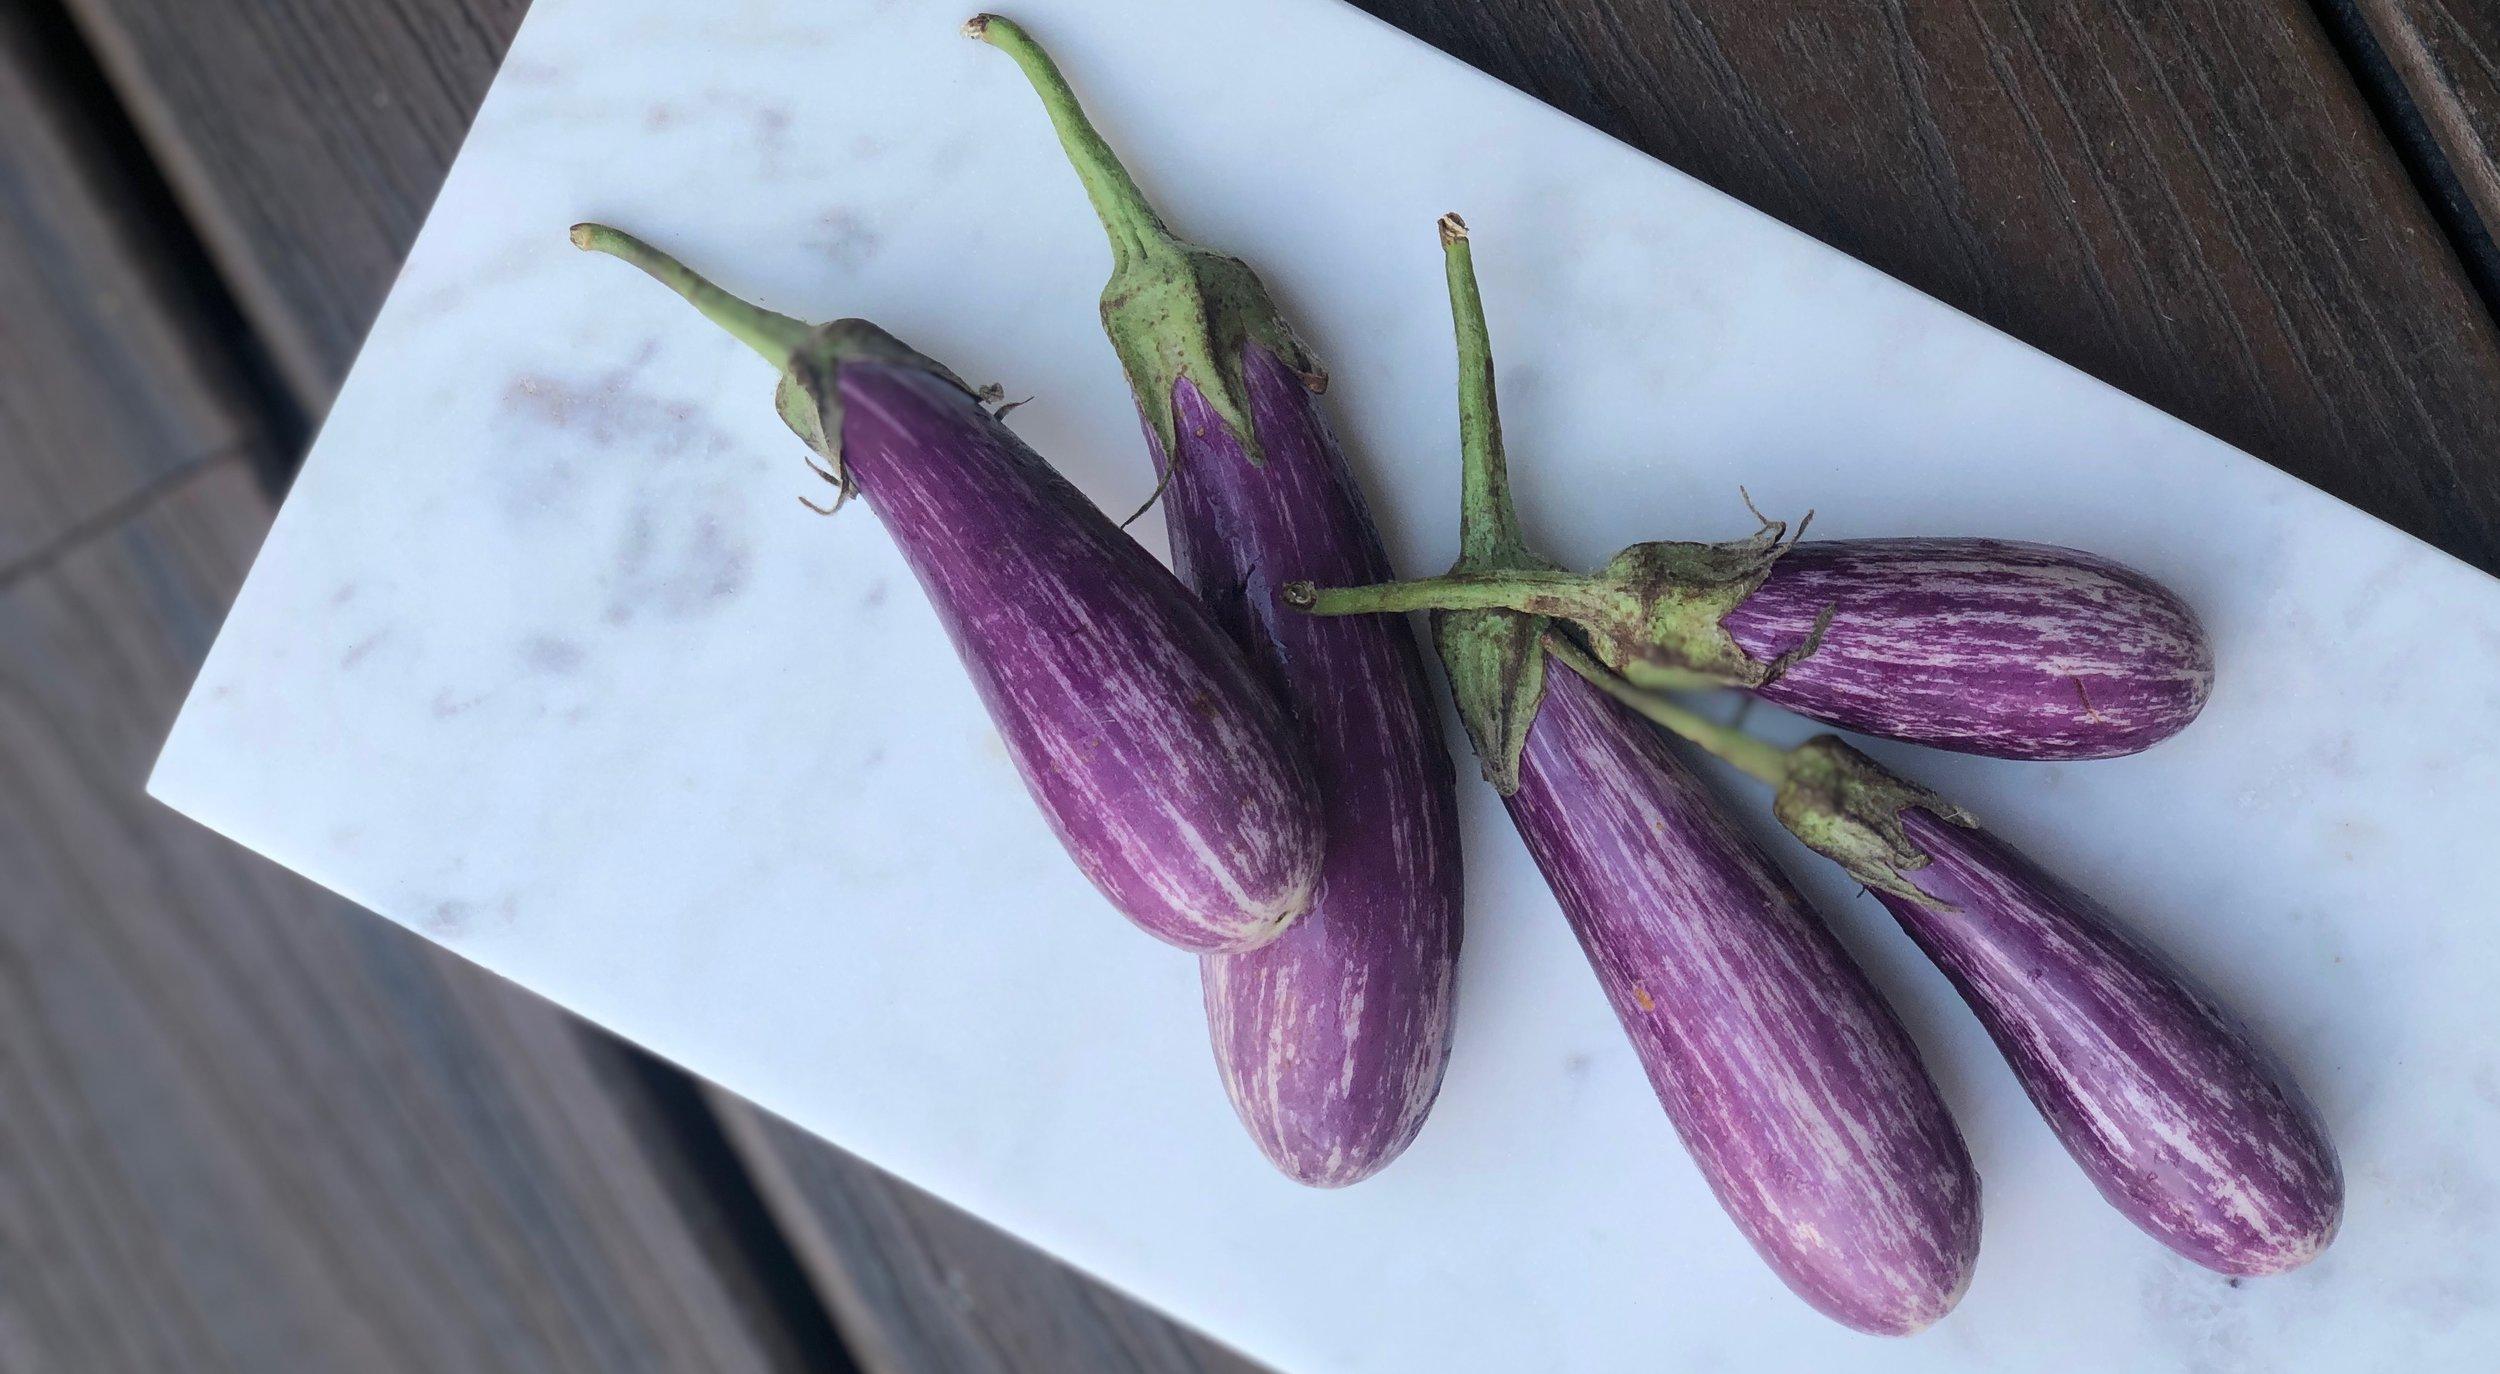 Fairytale Eggplants -  Belle Meadow - Tuscaloosa, Alabama